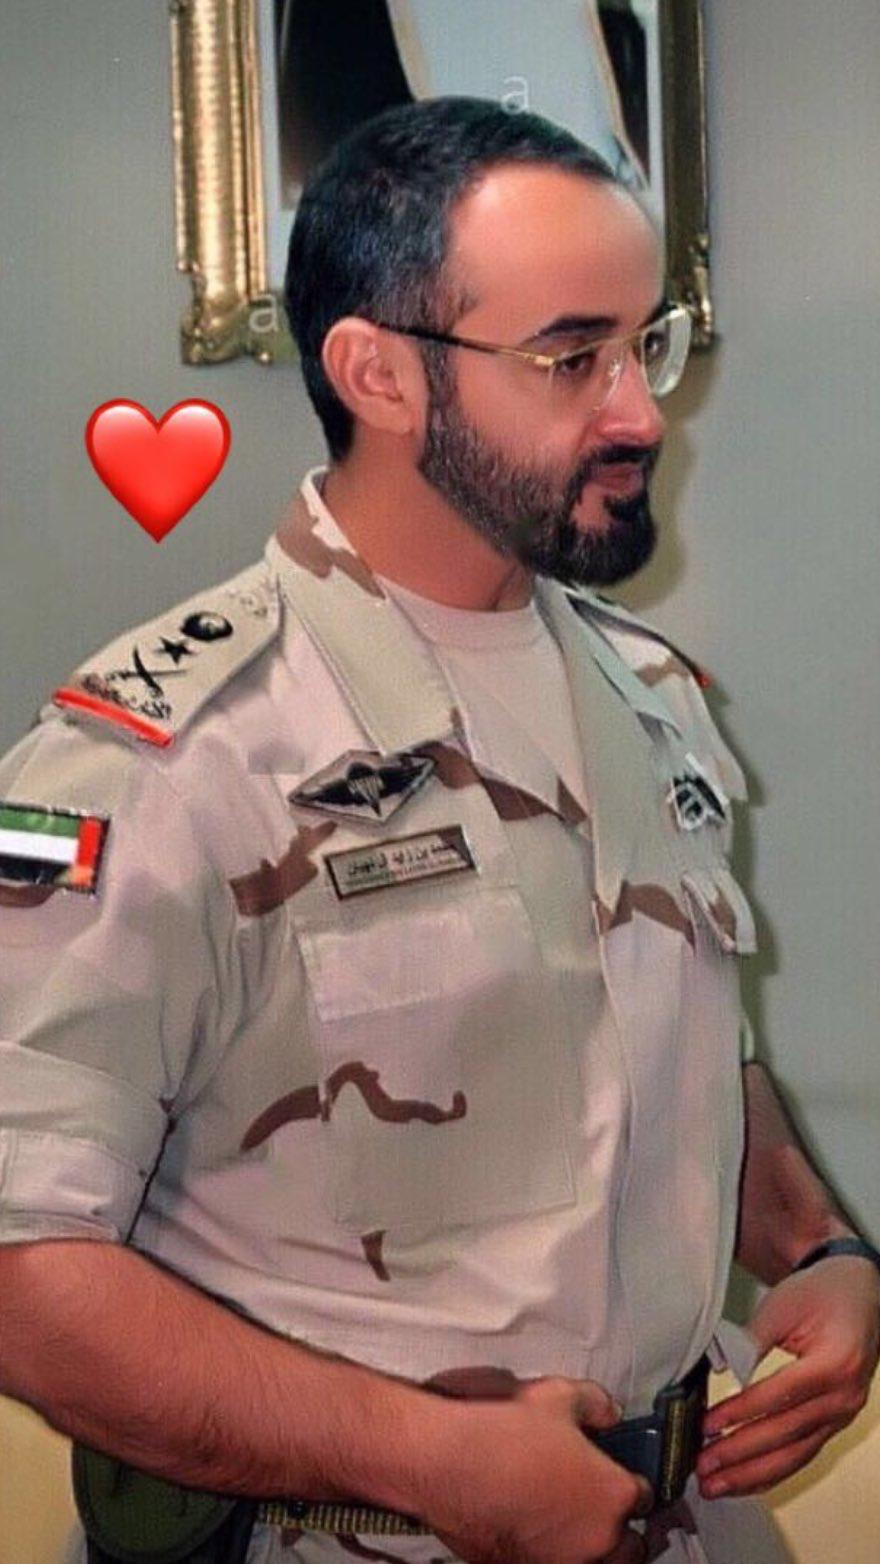 Sheikh Mohammed, United Arab Emirates, Abu Dhabi, Uae, Presidents, Crown,  Royals, Prince, Royalty